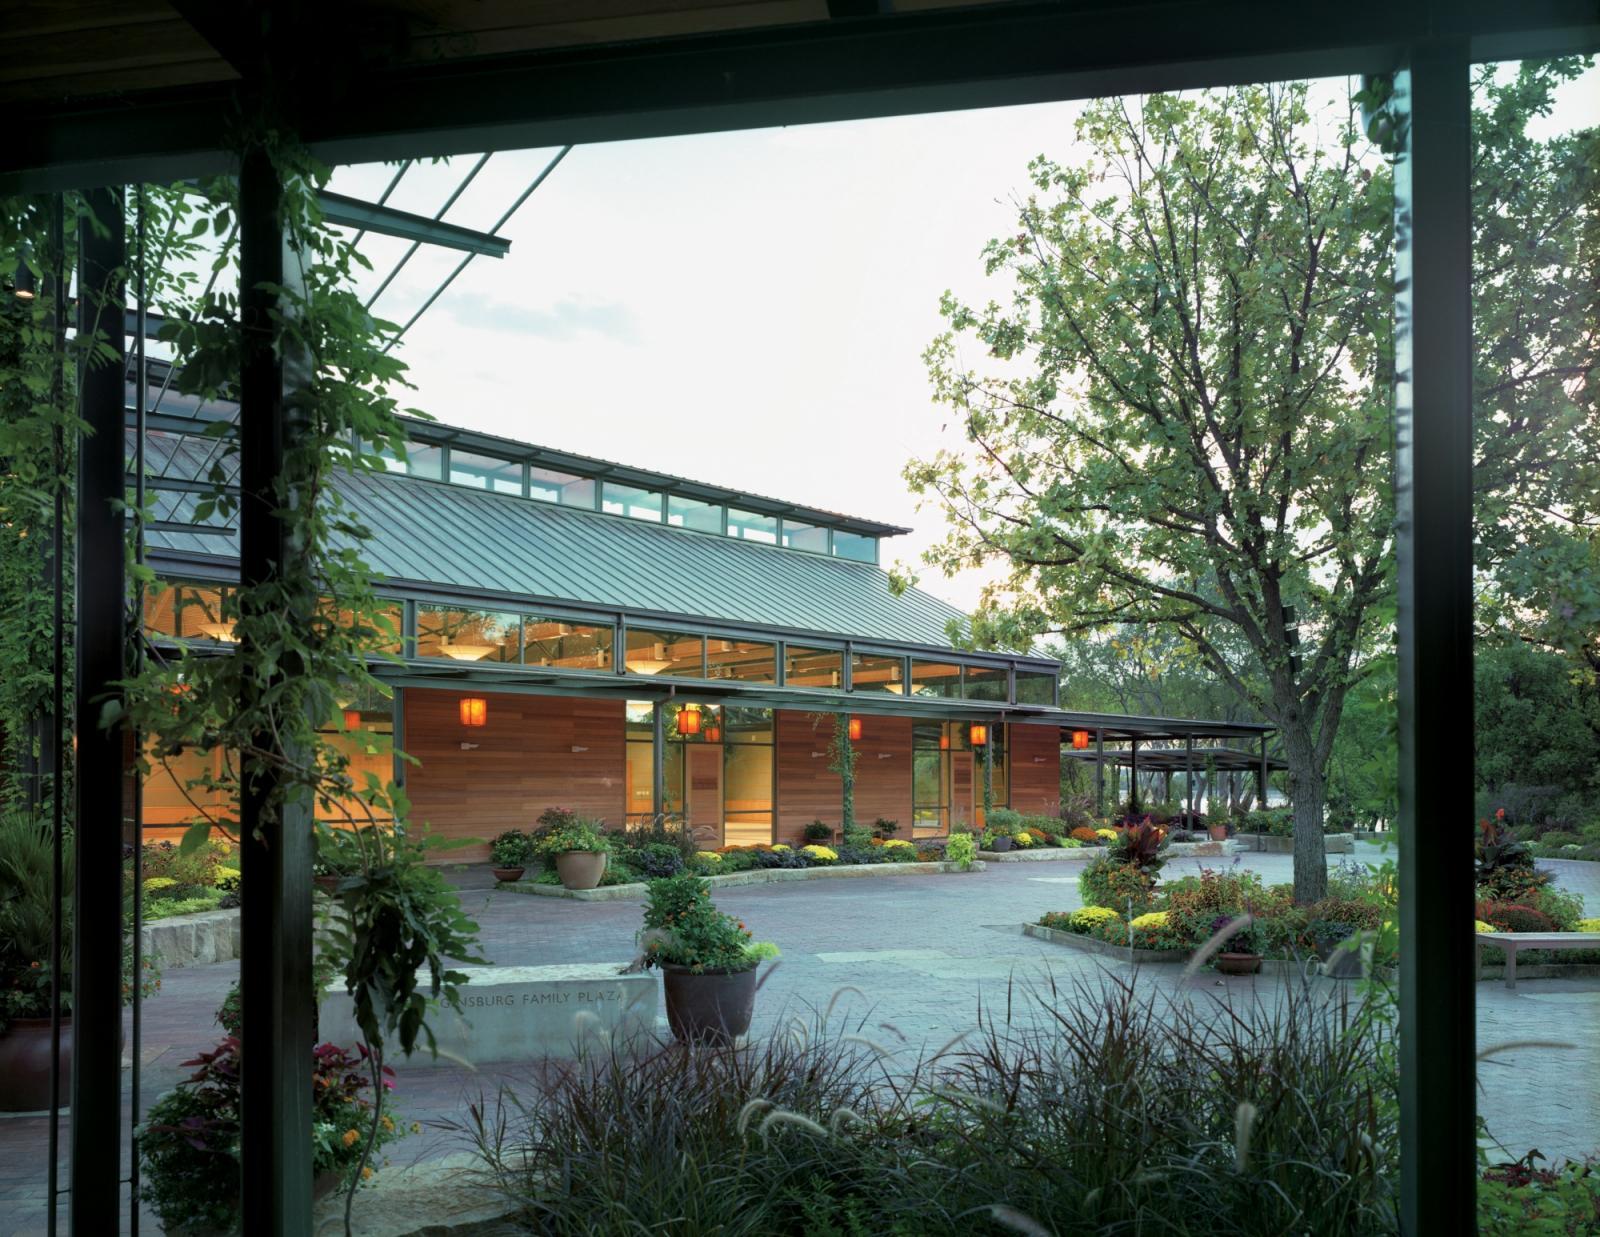 RLG Dallas Arboretum's Trammell Crow Visitor Education Pavilion